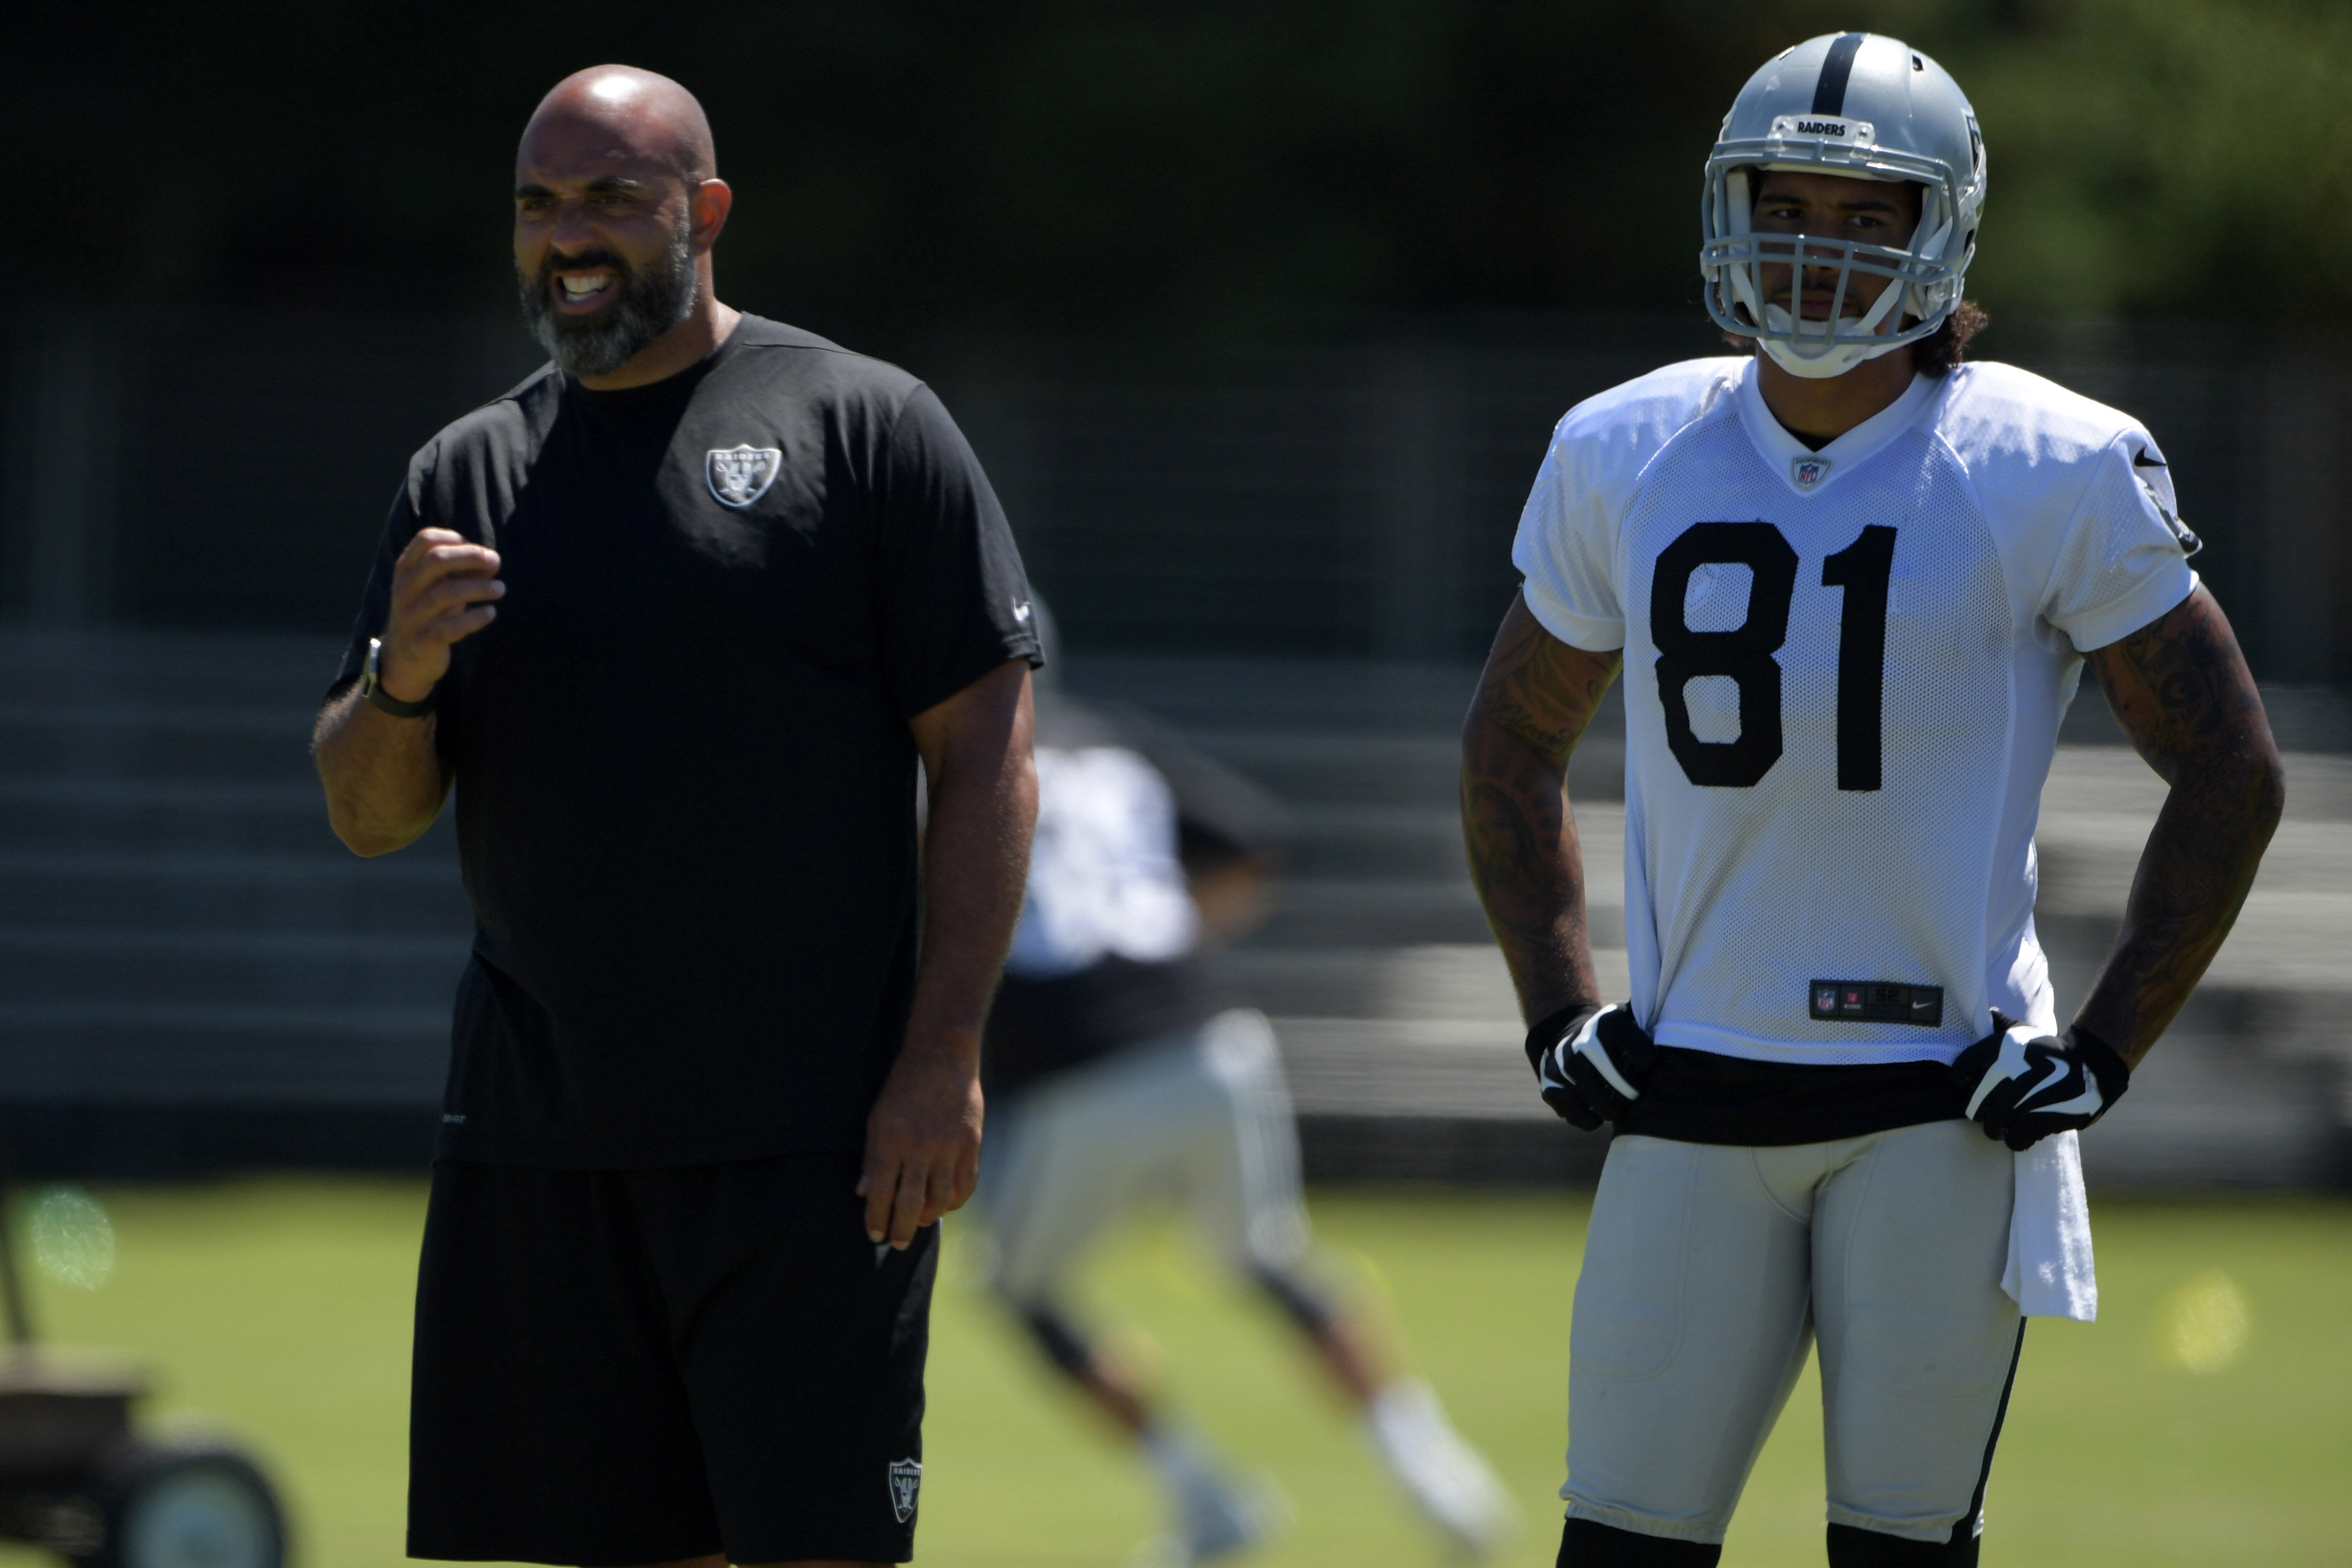 NFL: Oakland Raiders-Training Camp